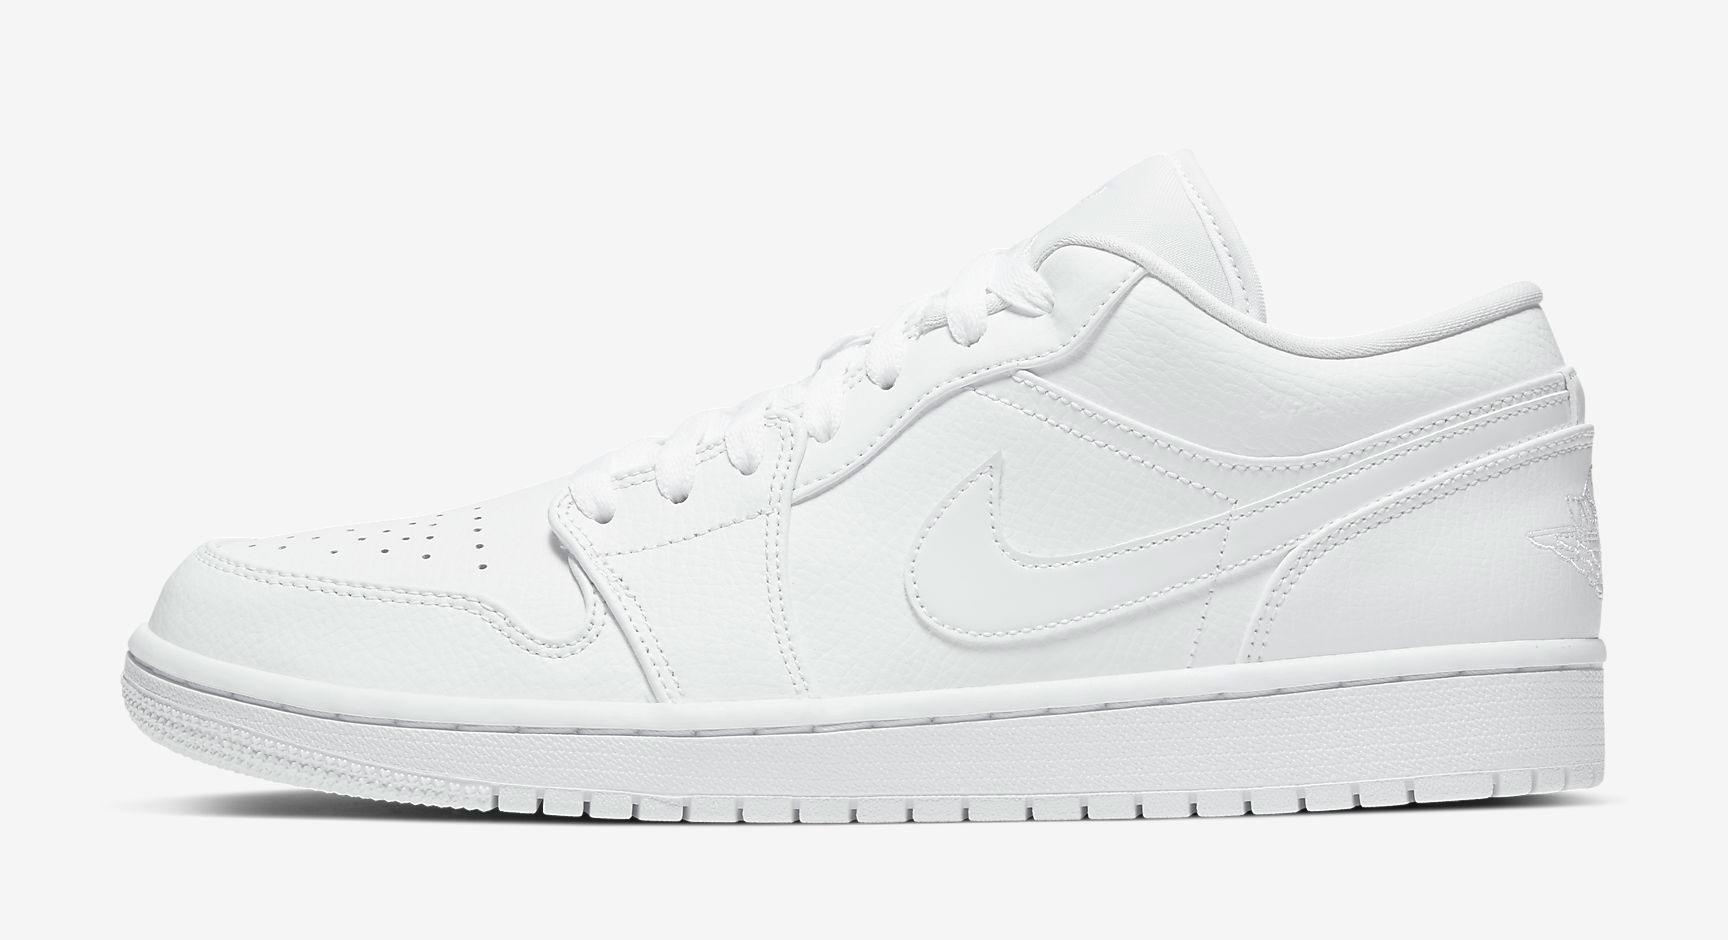 air-jordan-1-low-triple-white-release-date-2